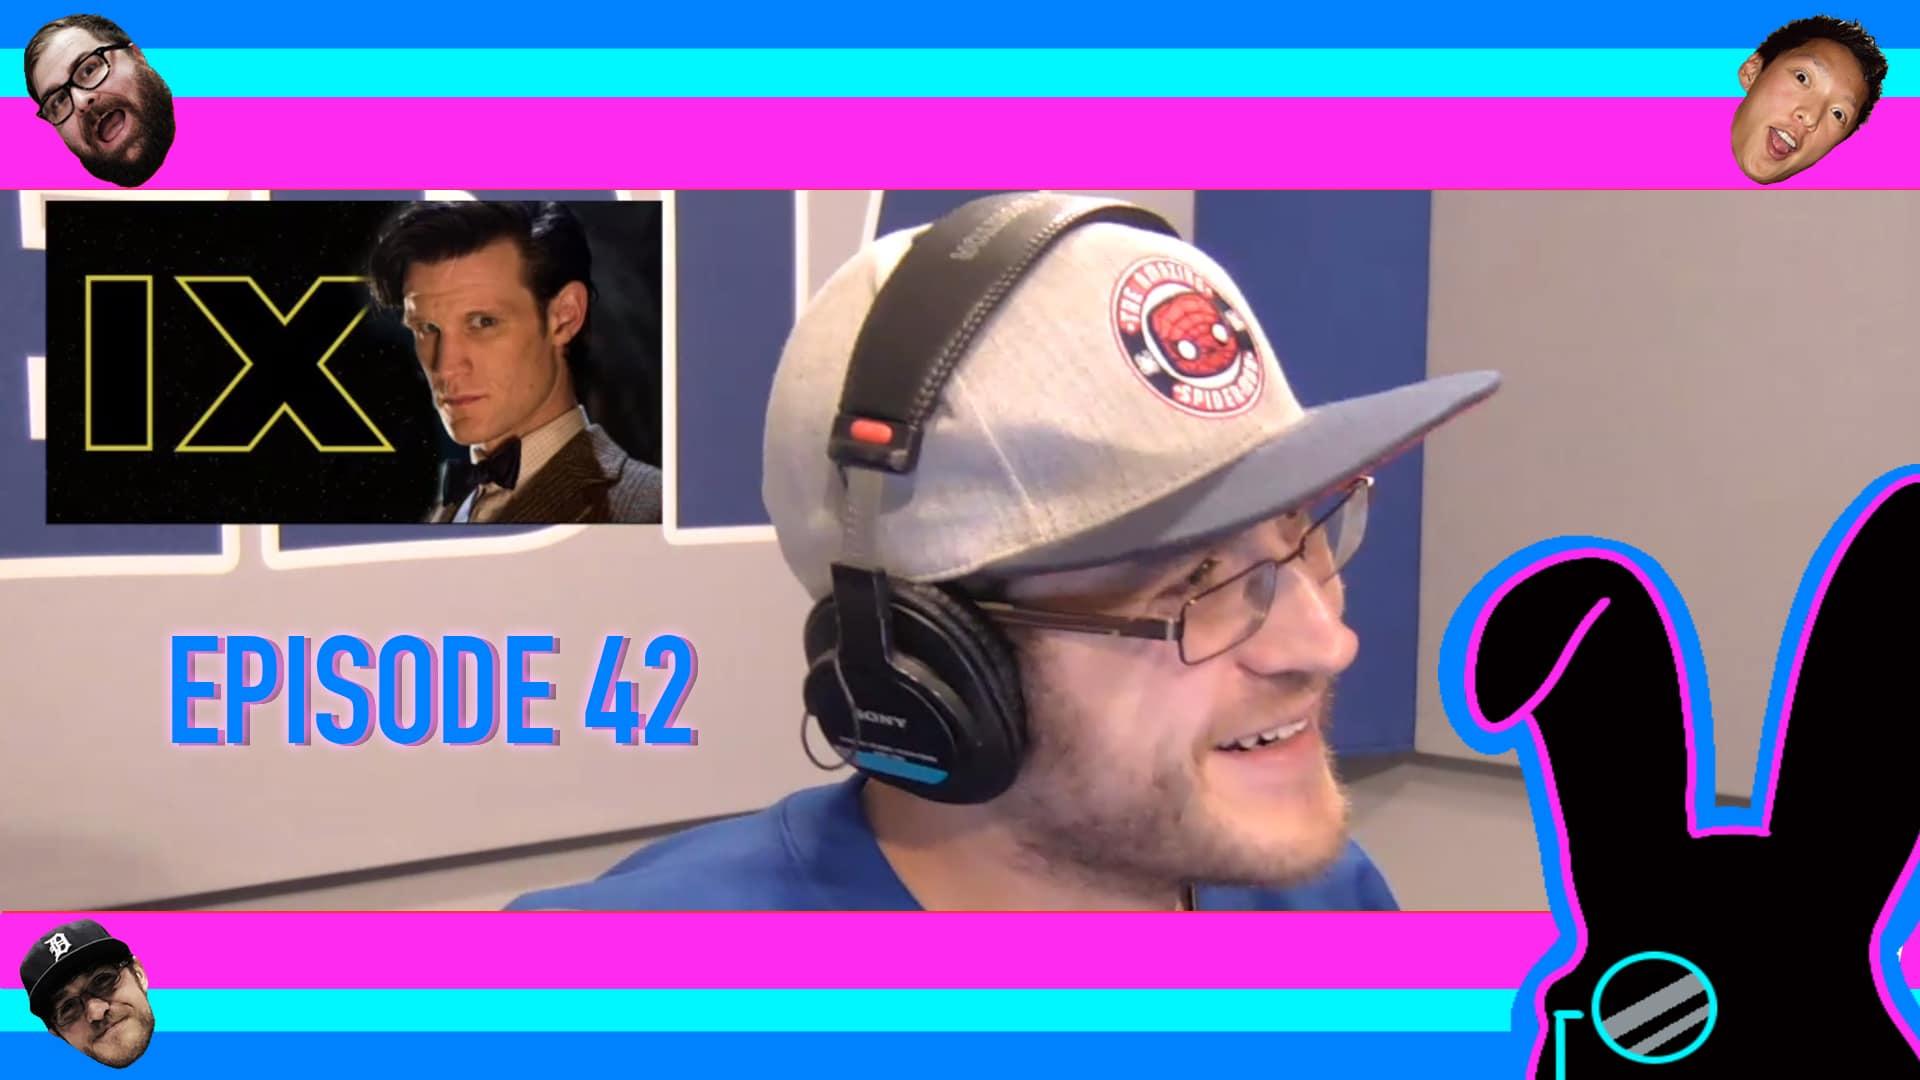 Geektainment Weekly - Episode 42